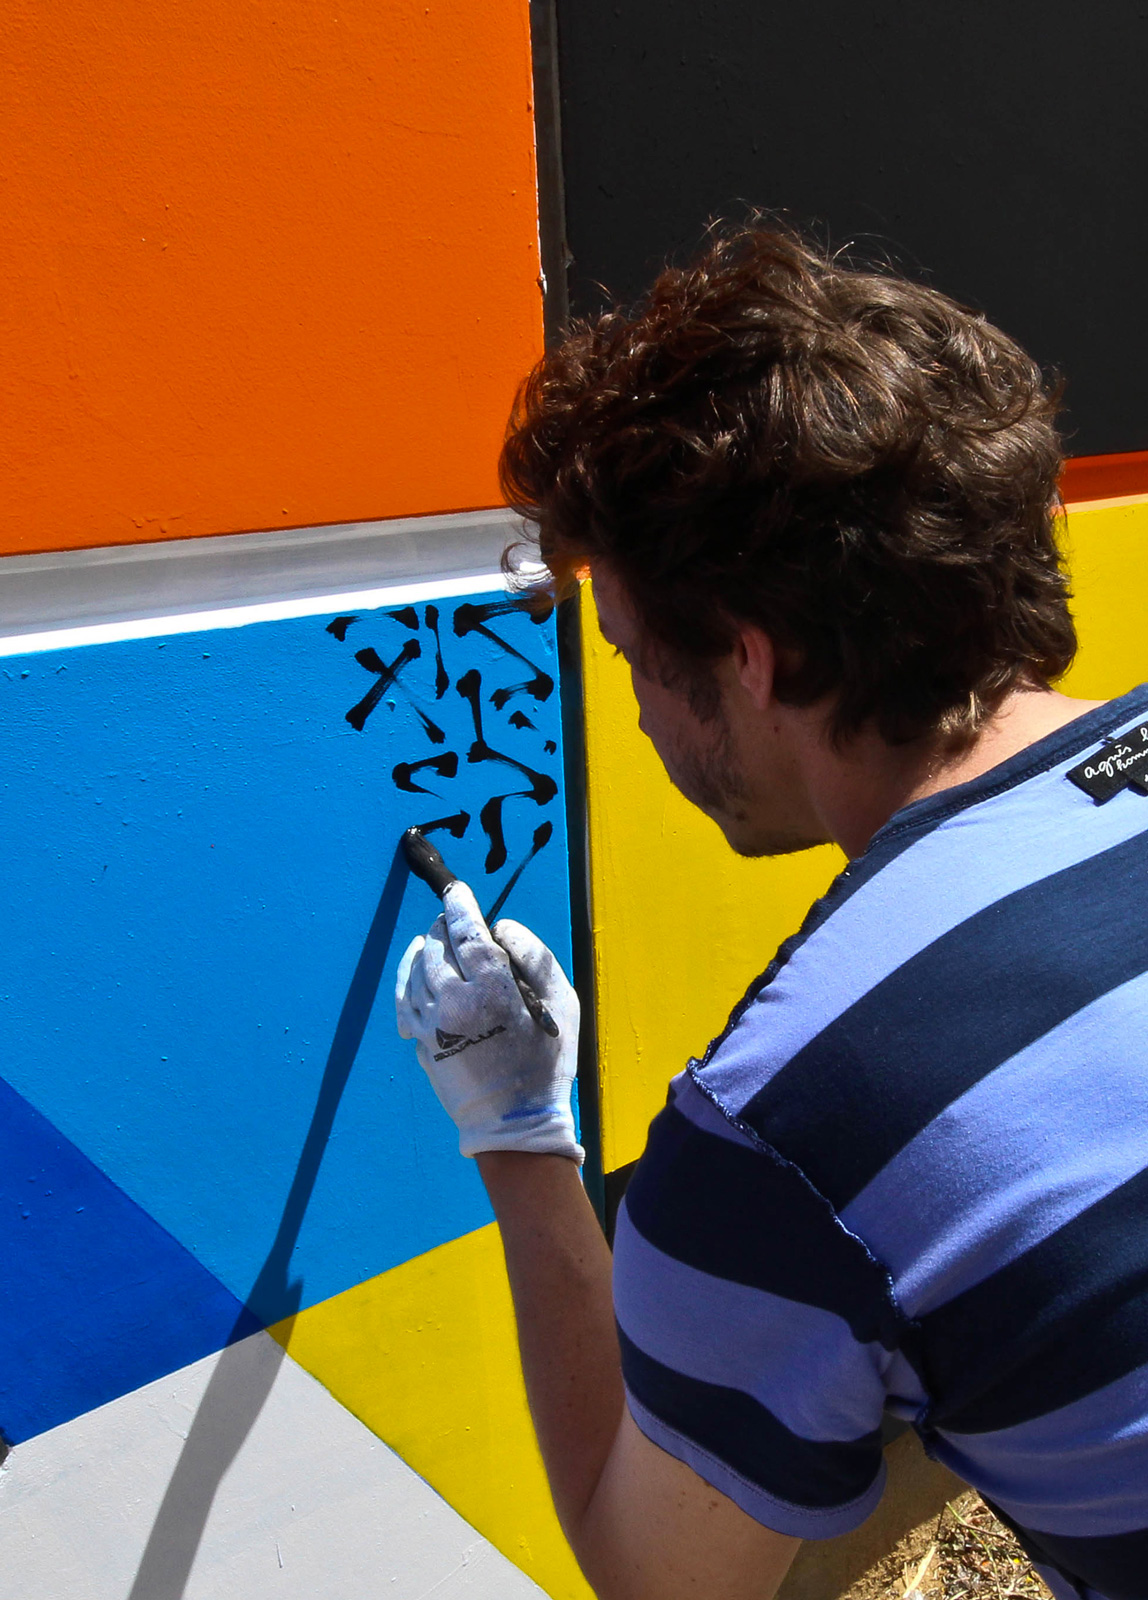 Lek-Sowat-DMV-da-mental-vaporz-graffiti-soldart-montana-bombe-spray-evry-paris-mur-peinture-nicolas-gzeley-6